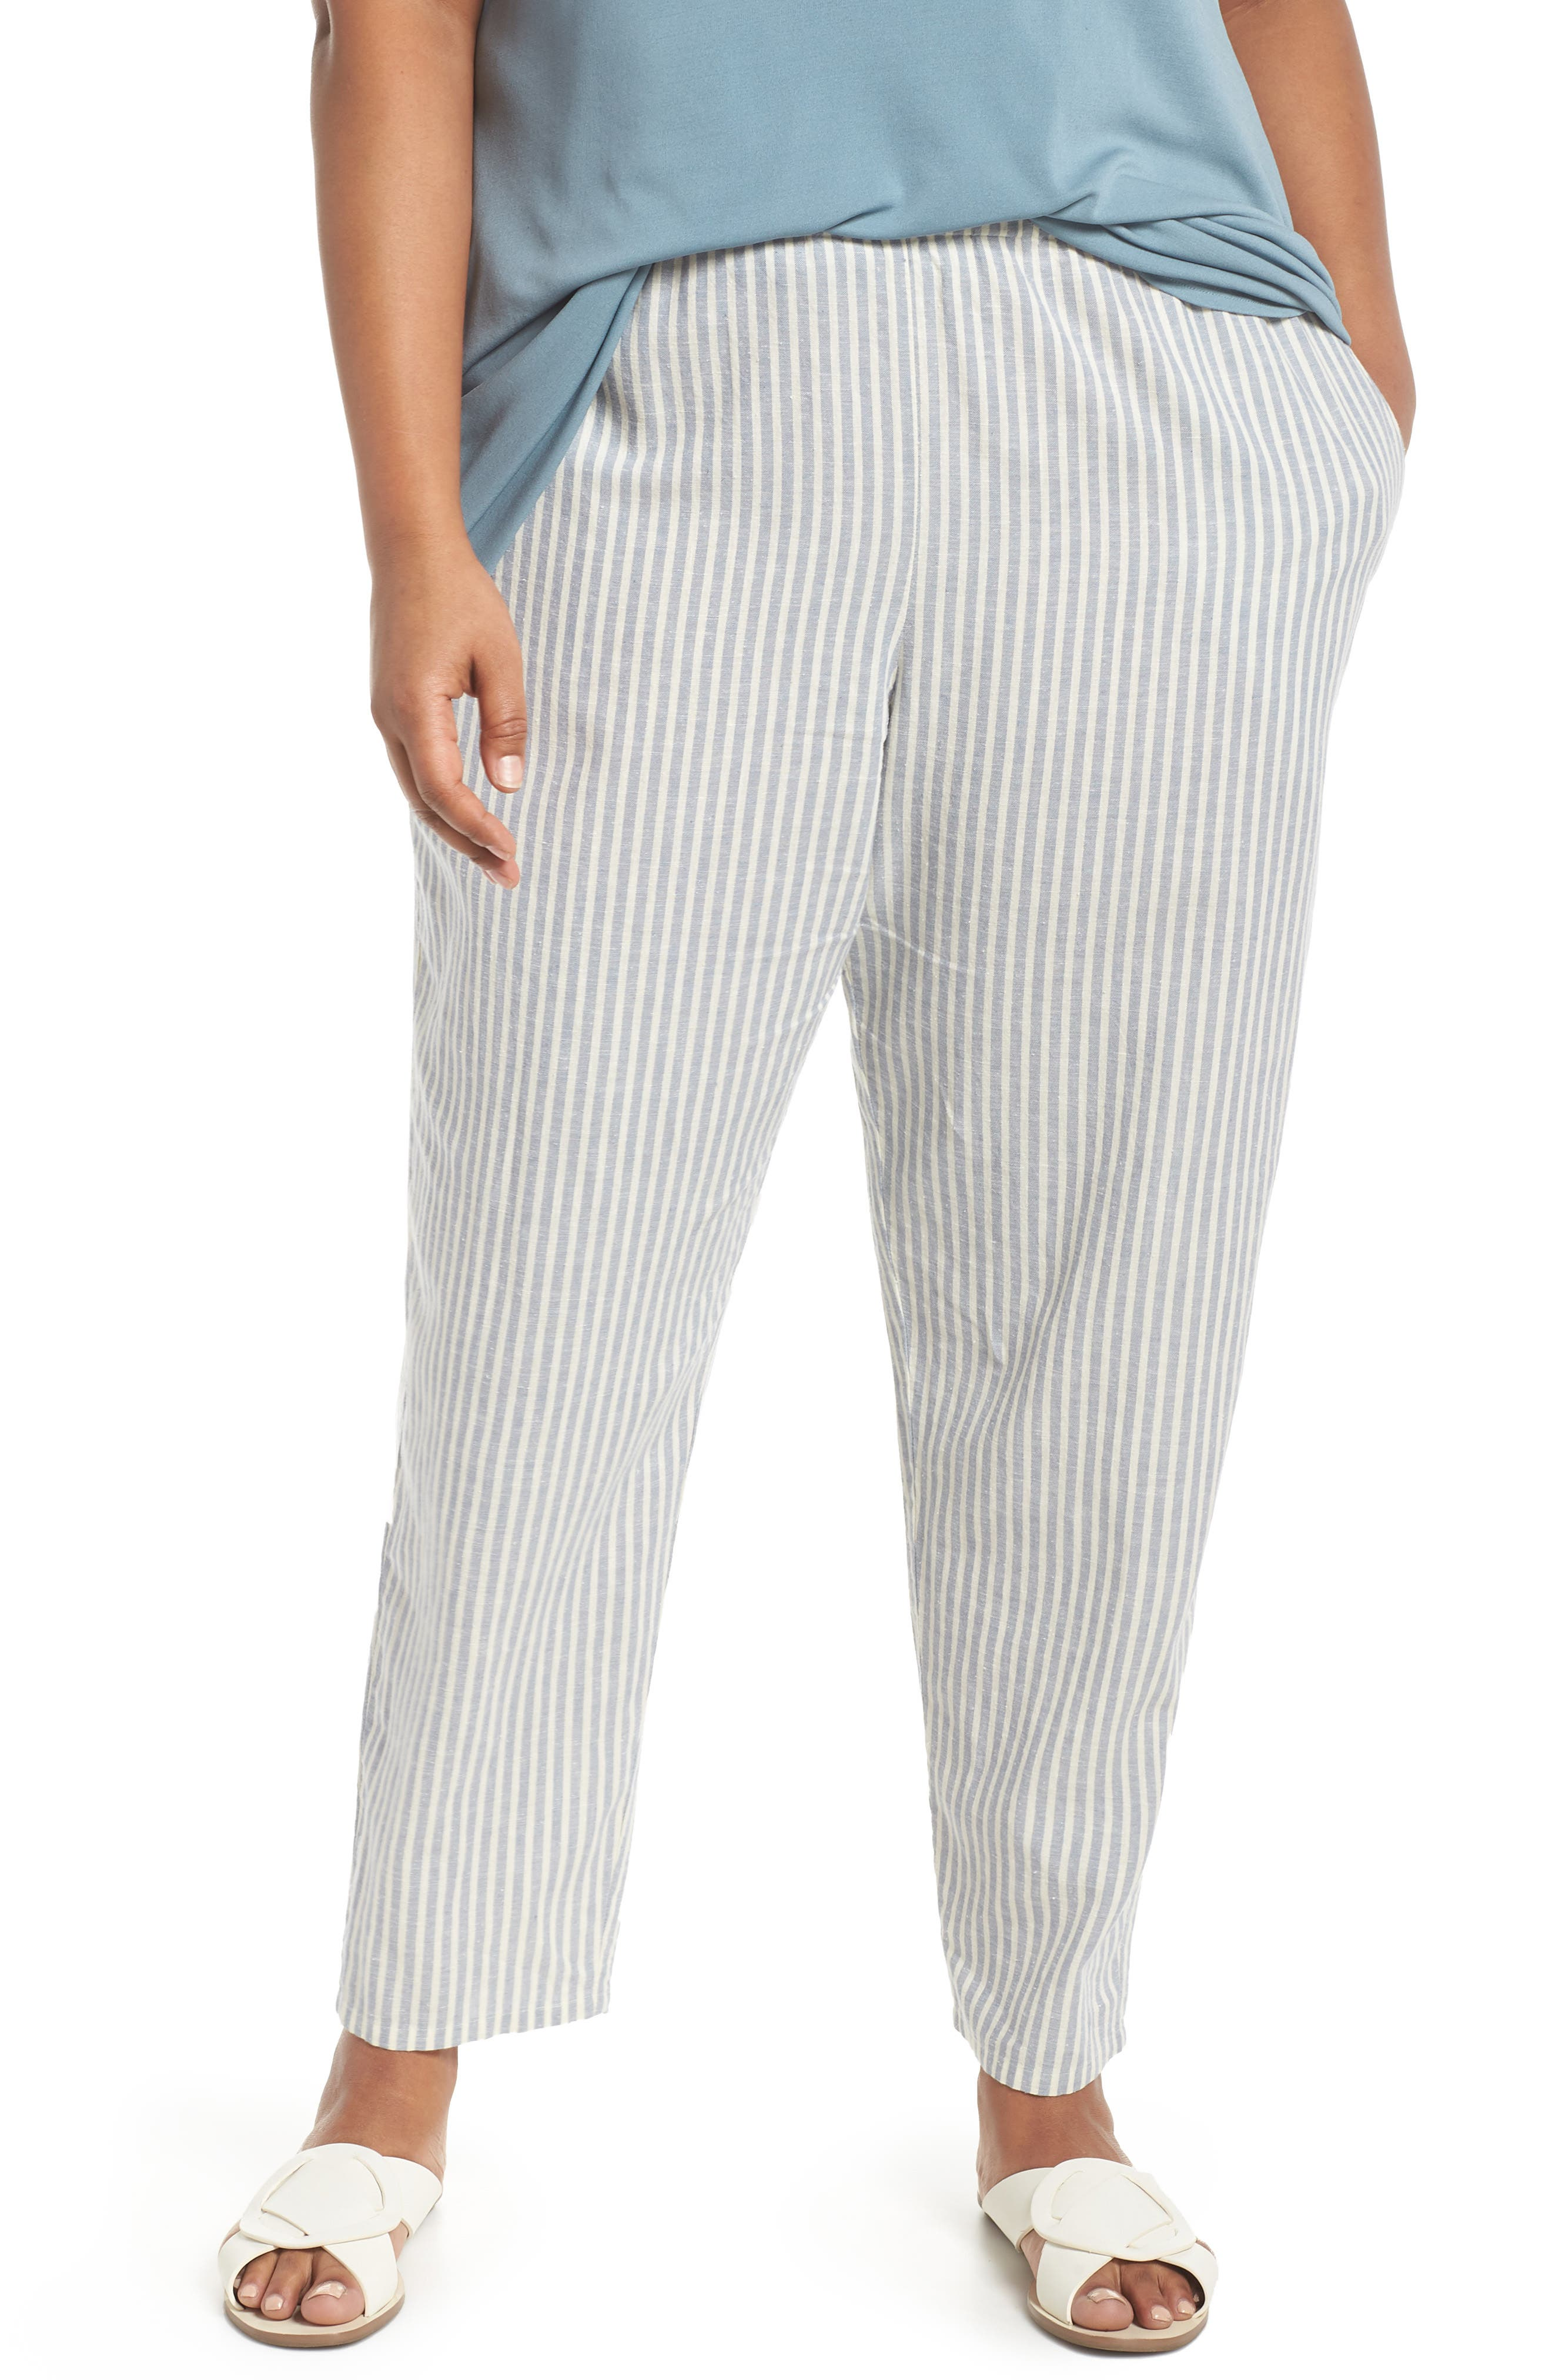 Stripe Ankle Hemp & Cotton Pants,                             Main thumbnail 1, color,                             Chambray